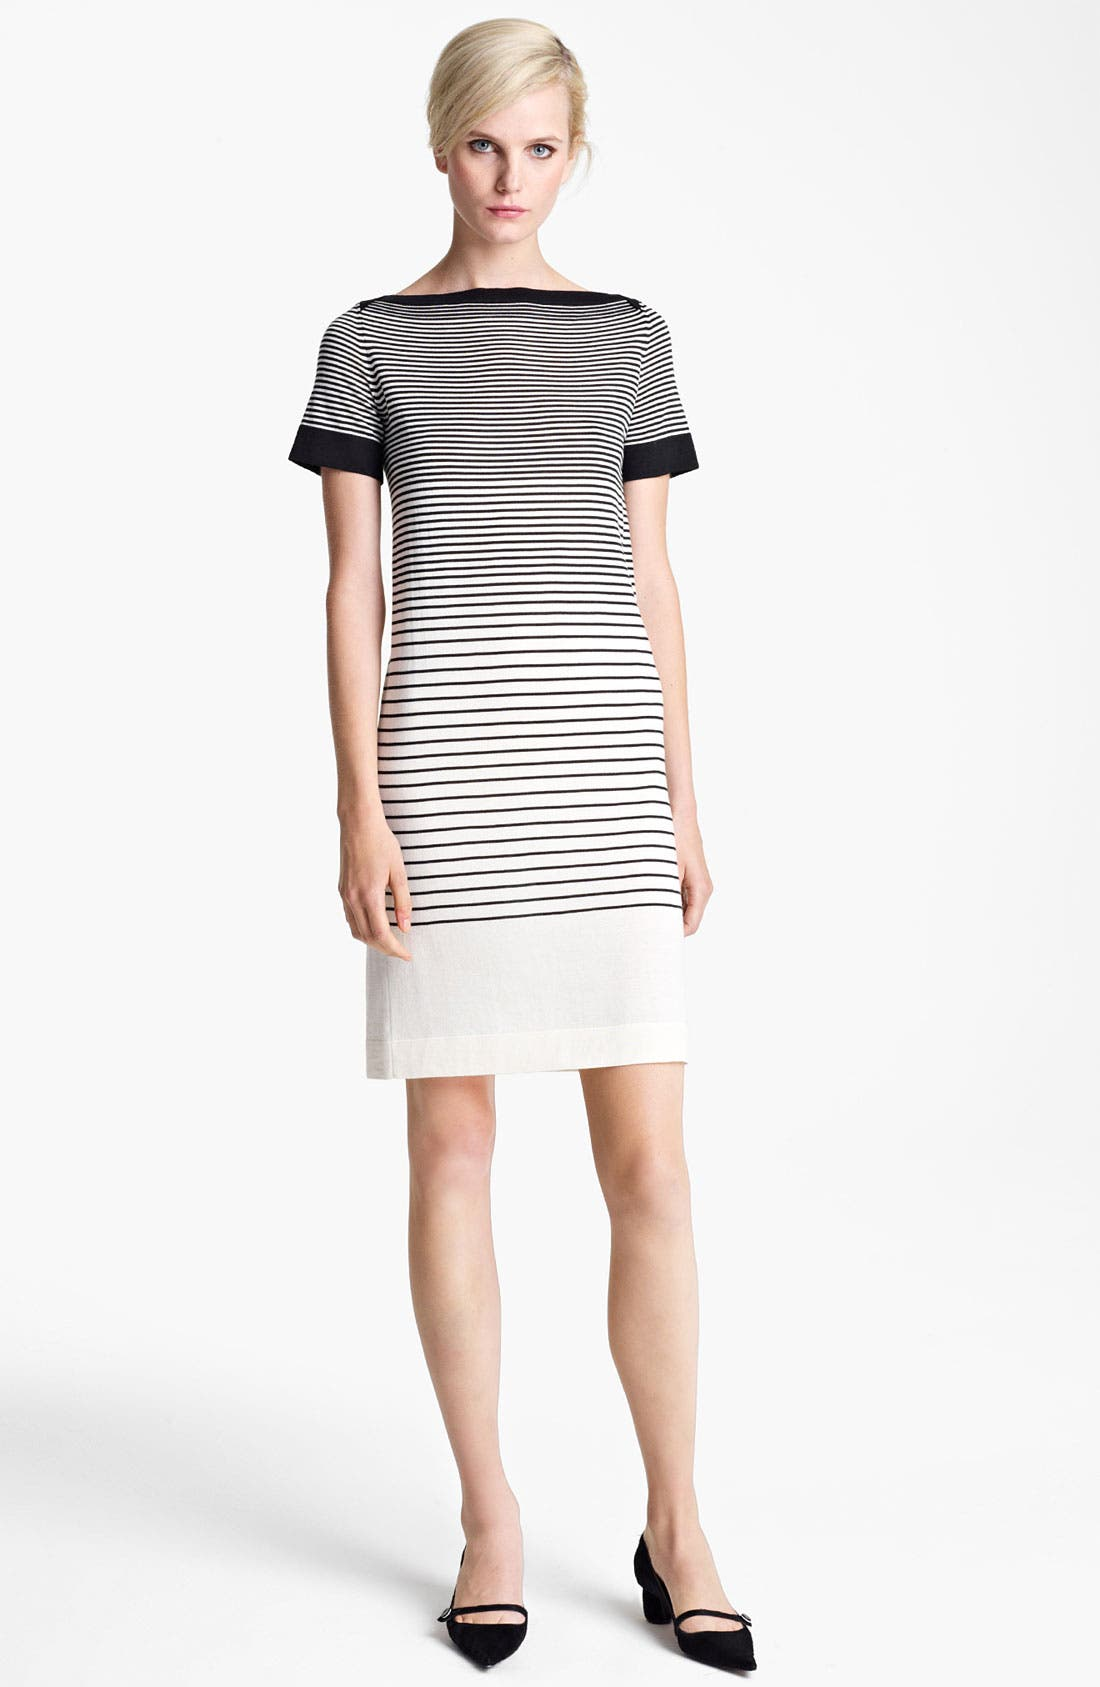 Alternate Image 1 Selected - MARC JACOBS Stripe Short Sleeve Dress